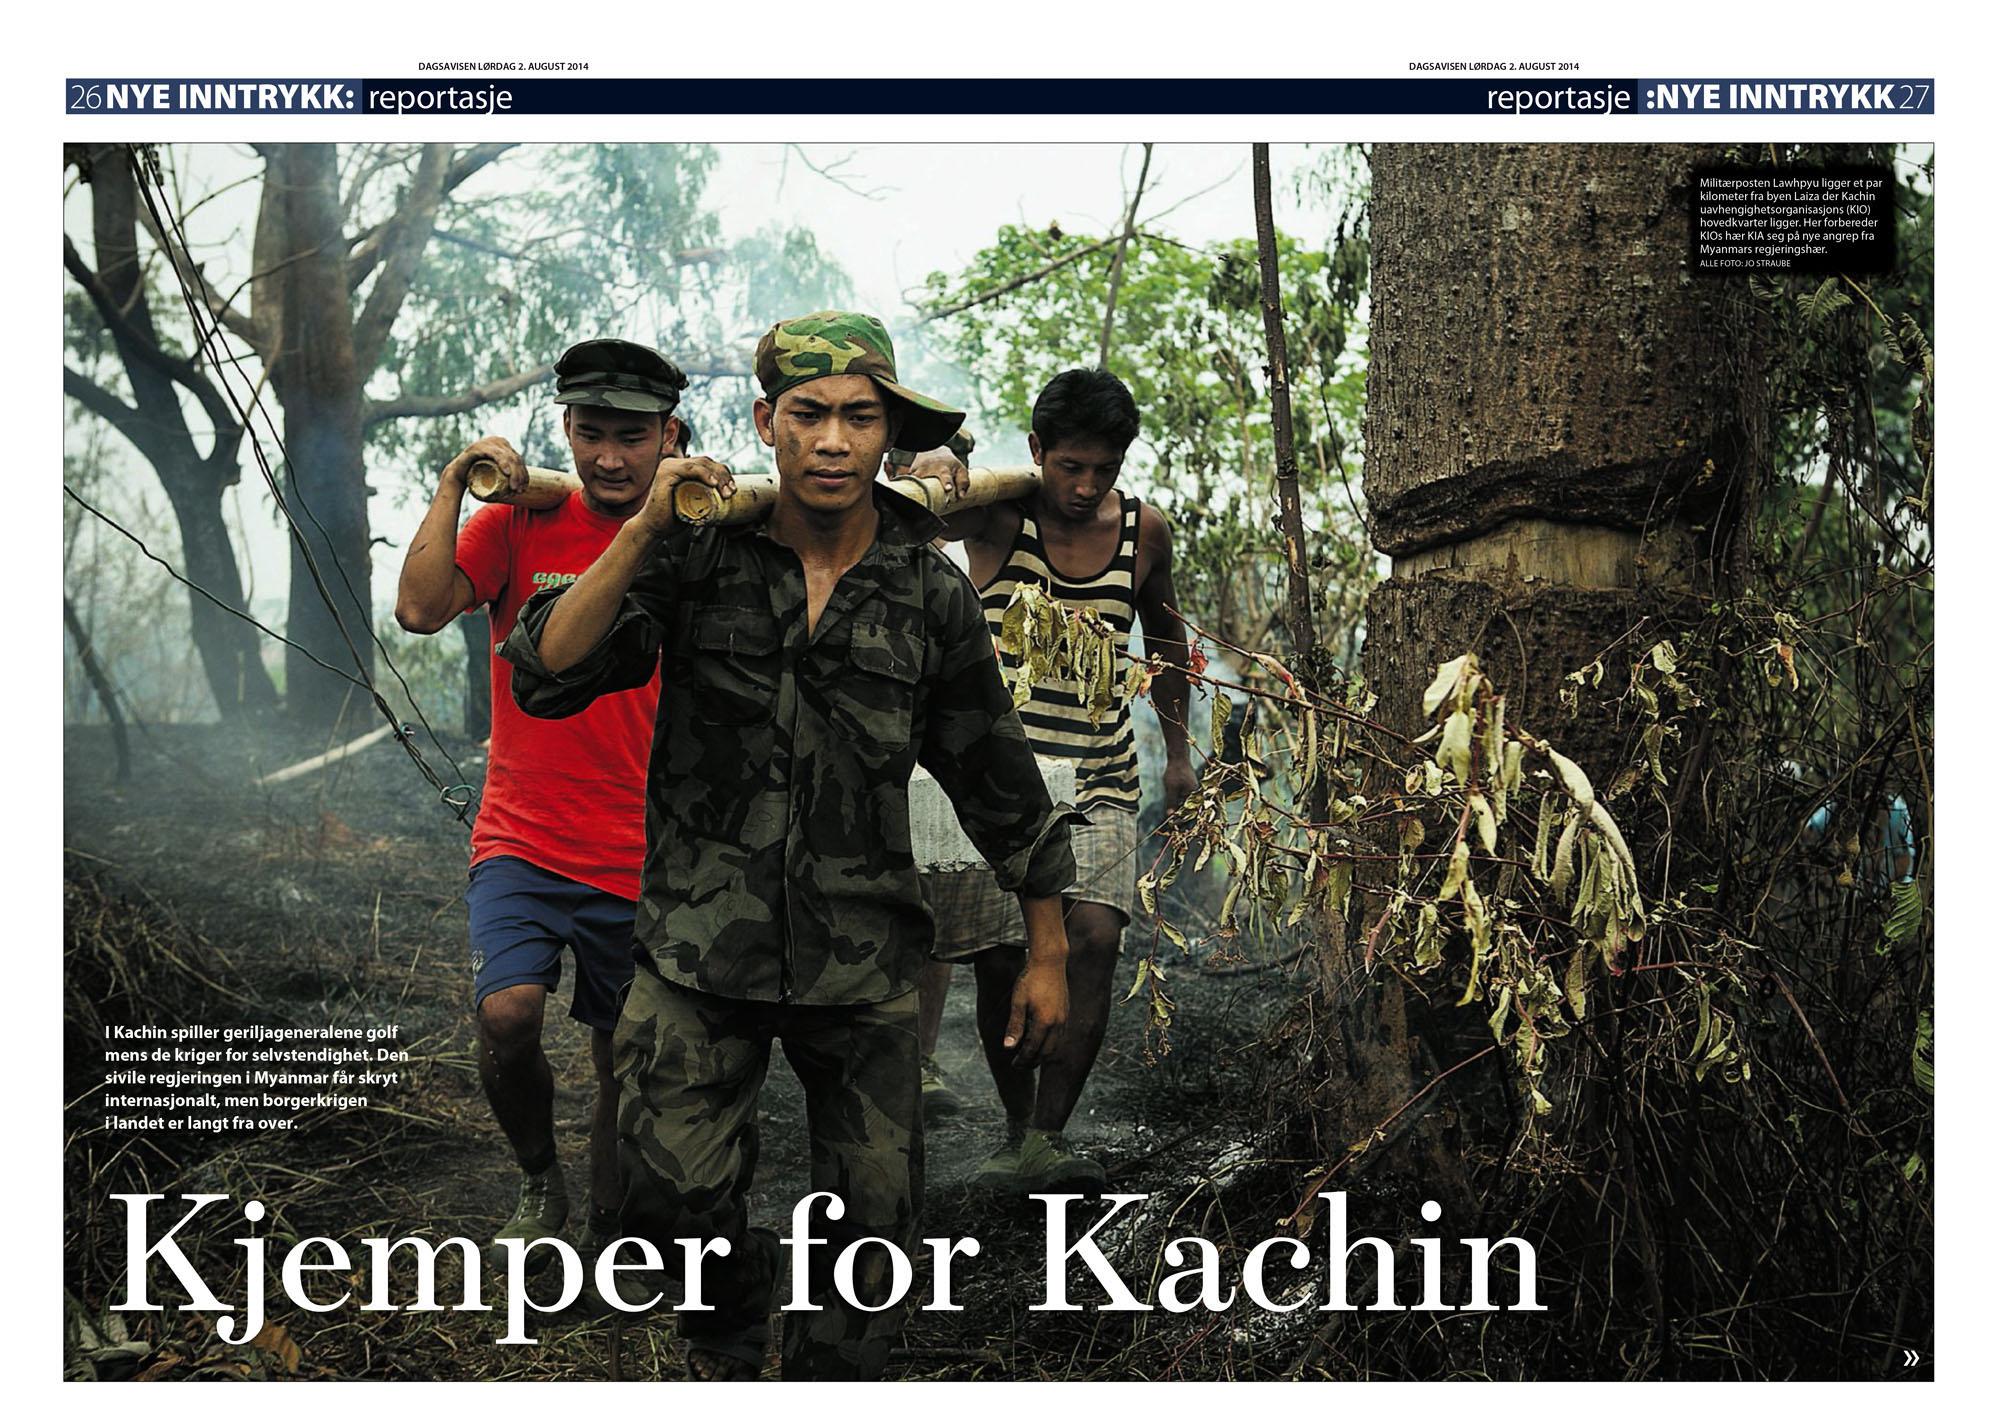 Dagsavisen, 2.august 2014